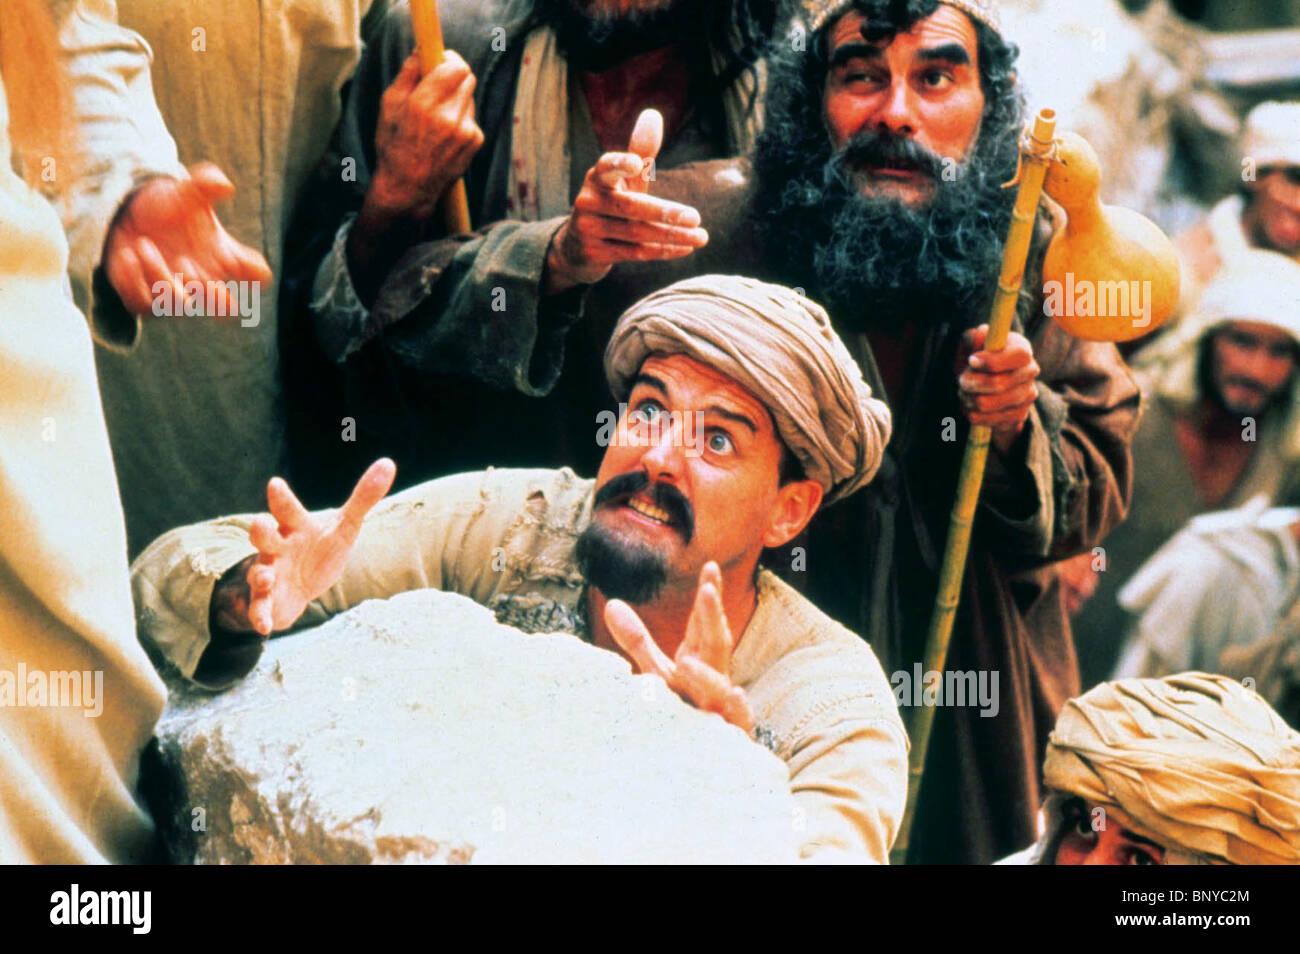 John Cleese Michael Palin Monty Python S Life Of Brian 1979 Stock Photo Alamy